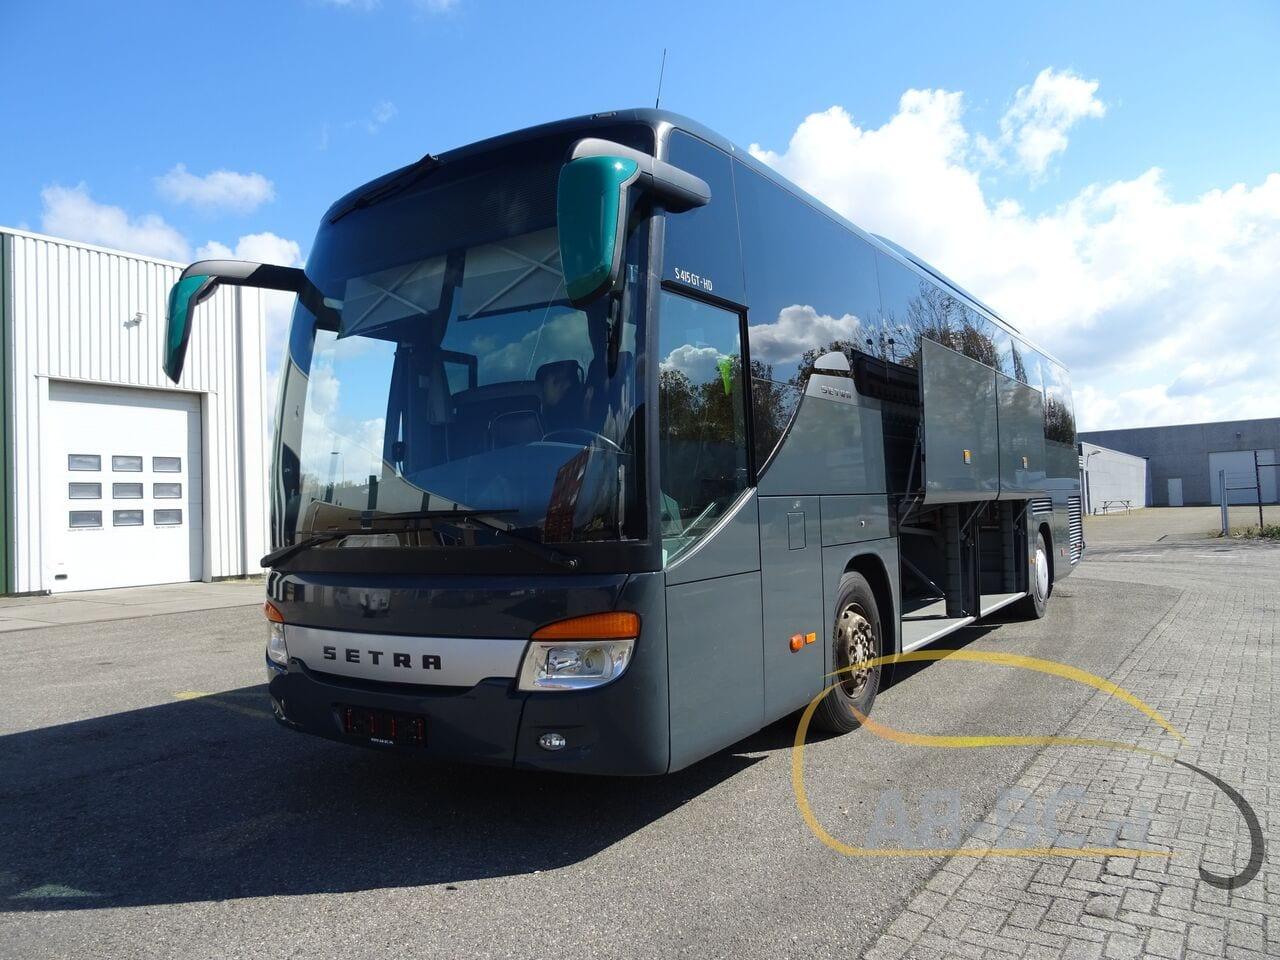 coach-busSETRA-S415-GT-HD-FINAL-EDITION-51-SEATS-LIFTBUS---1620381837209871243_big_02702d99eb1879777b518c41be6b68fc--21050713010665719300